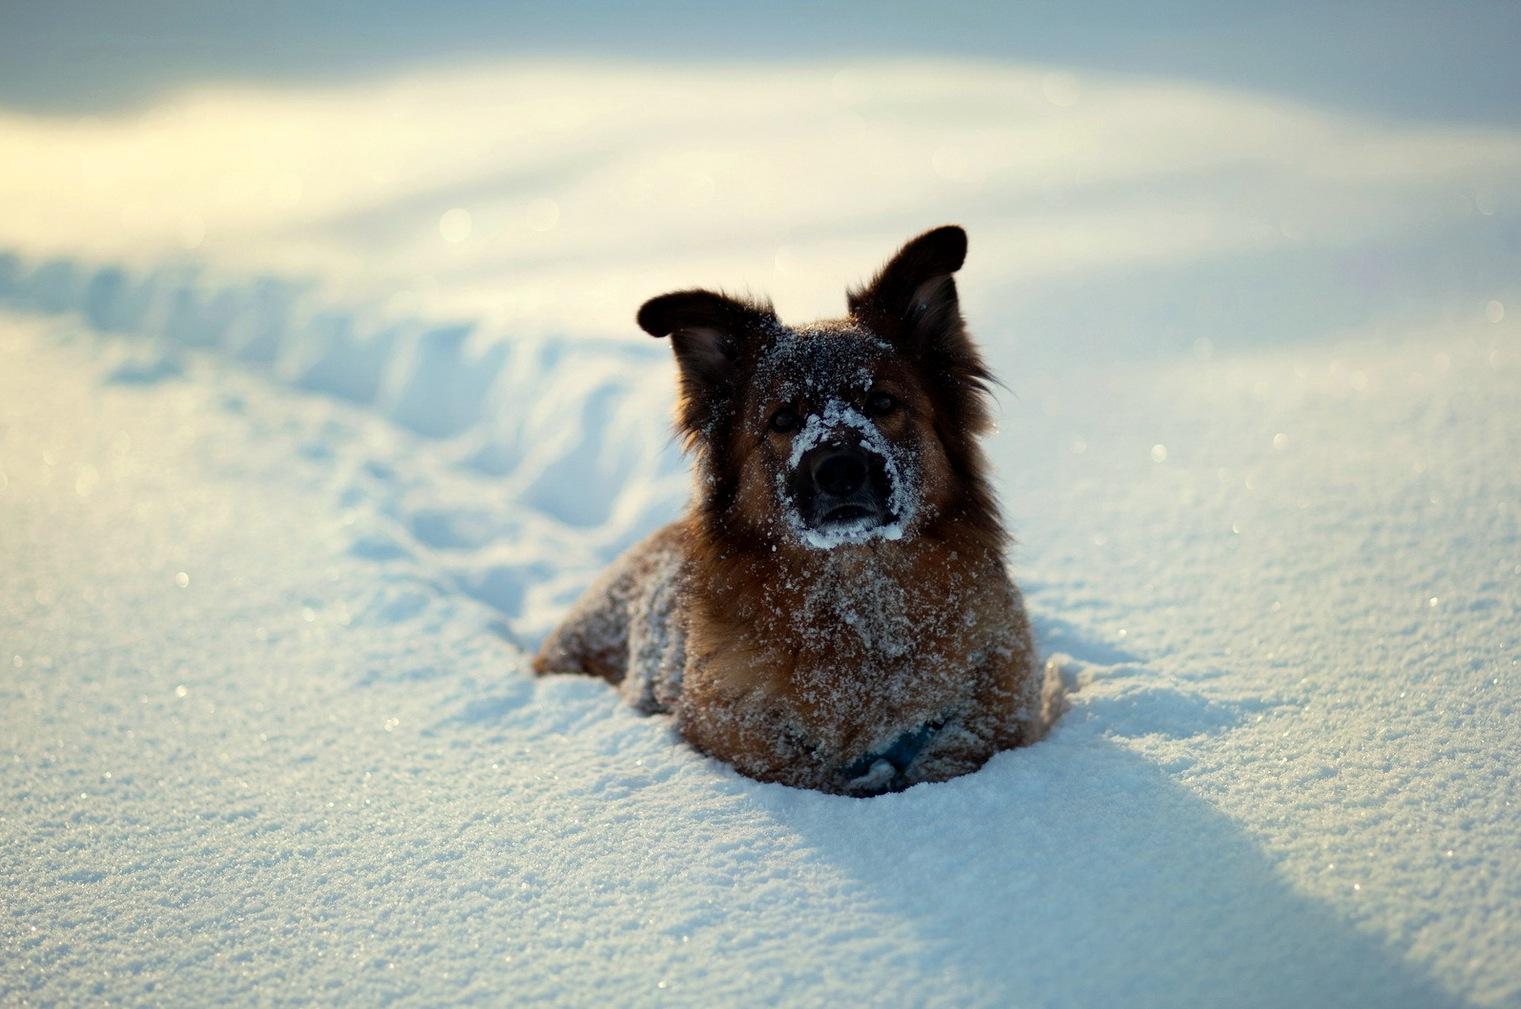 Animals___Dogs_The_dog_in_deep_snow_087713_.jpg